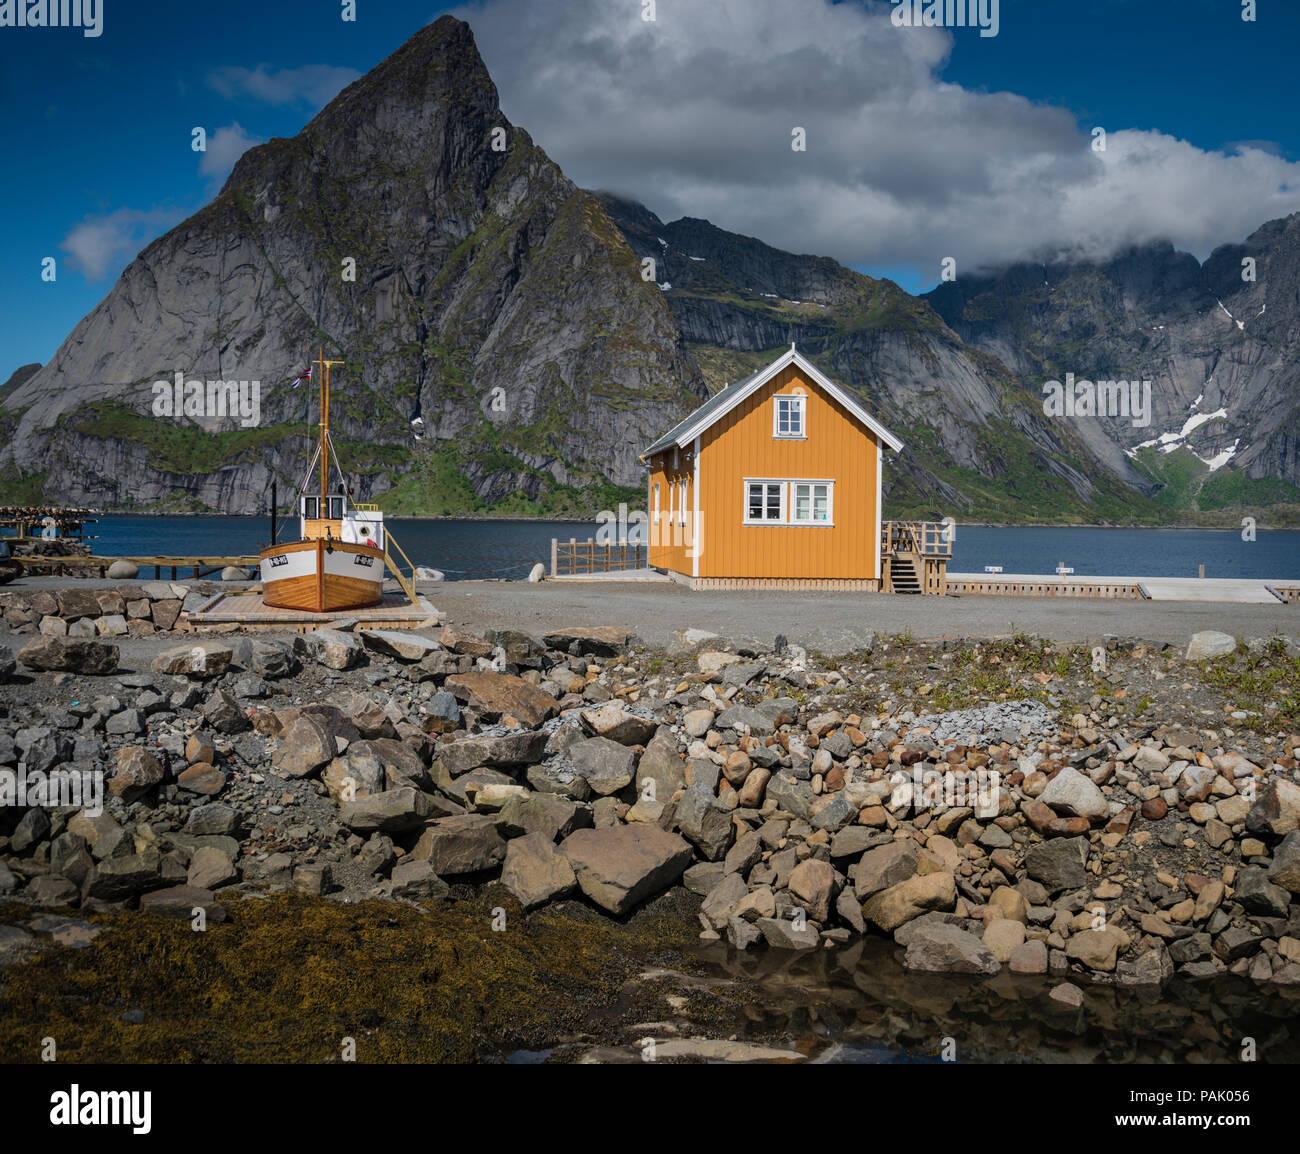 Reine, Lofoten Islands, Norway. Stock Photo